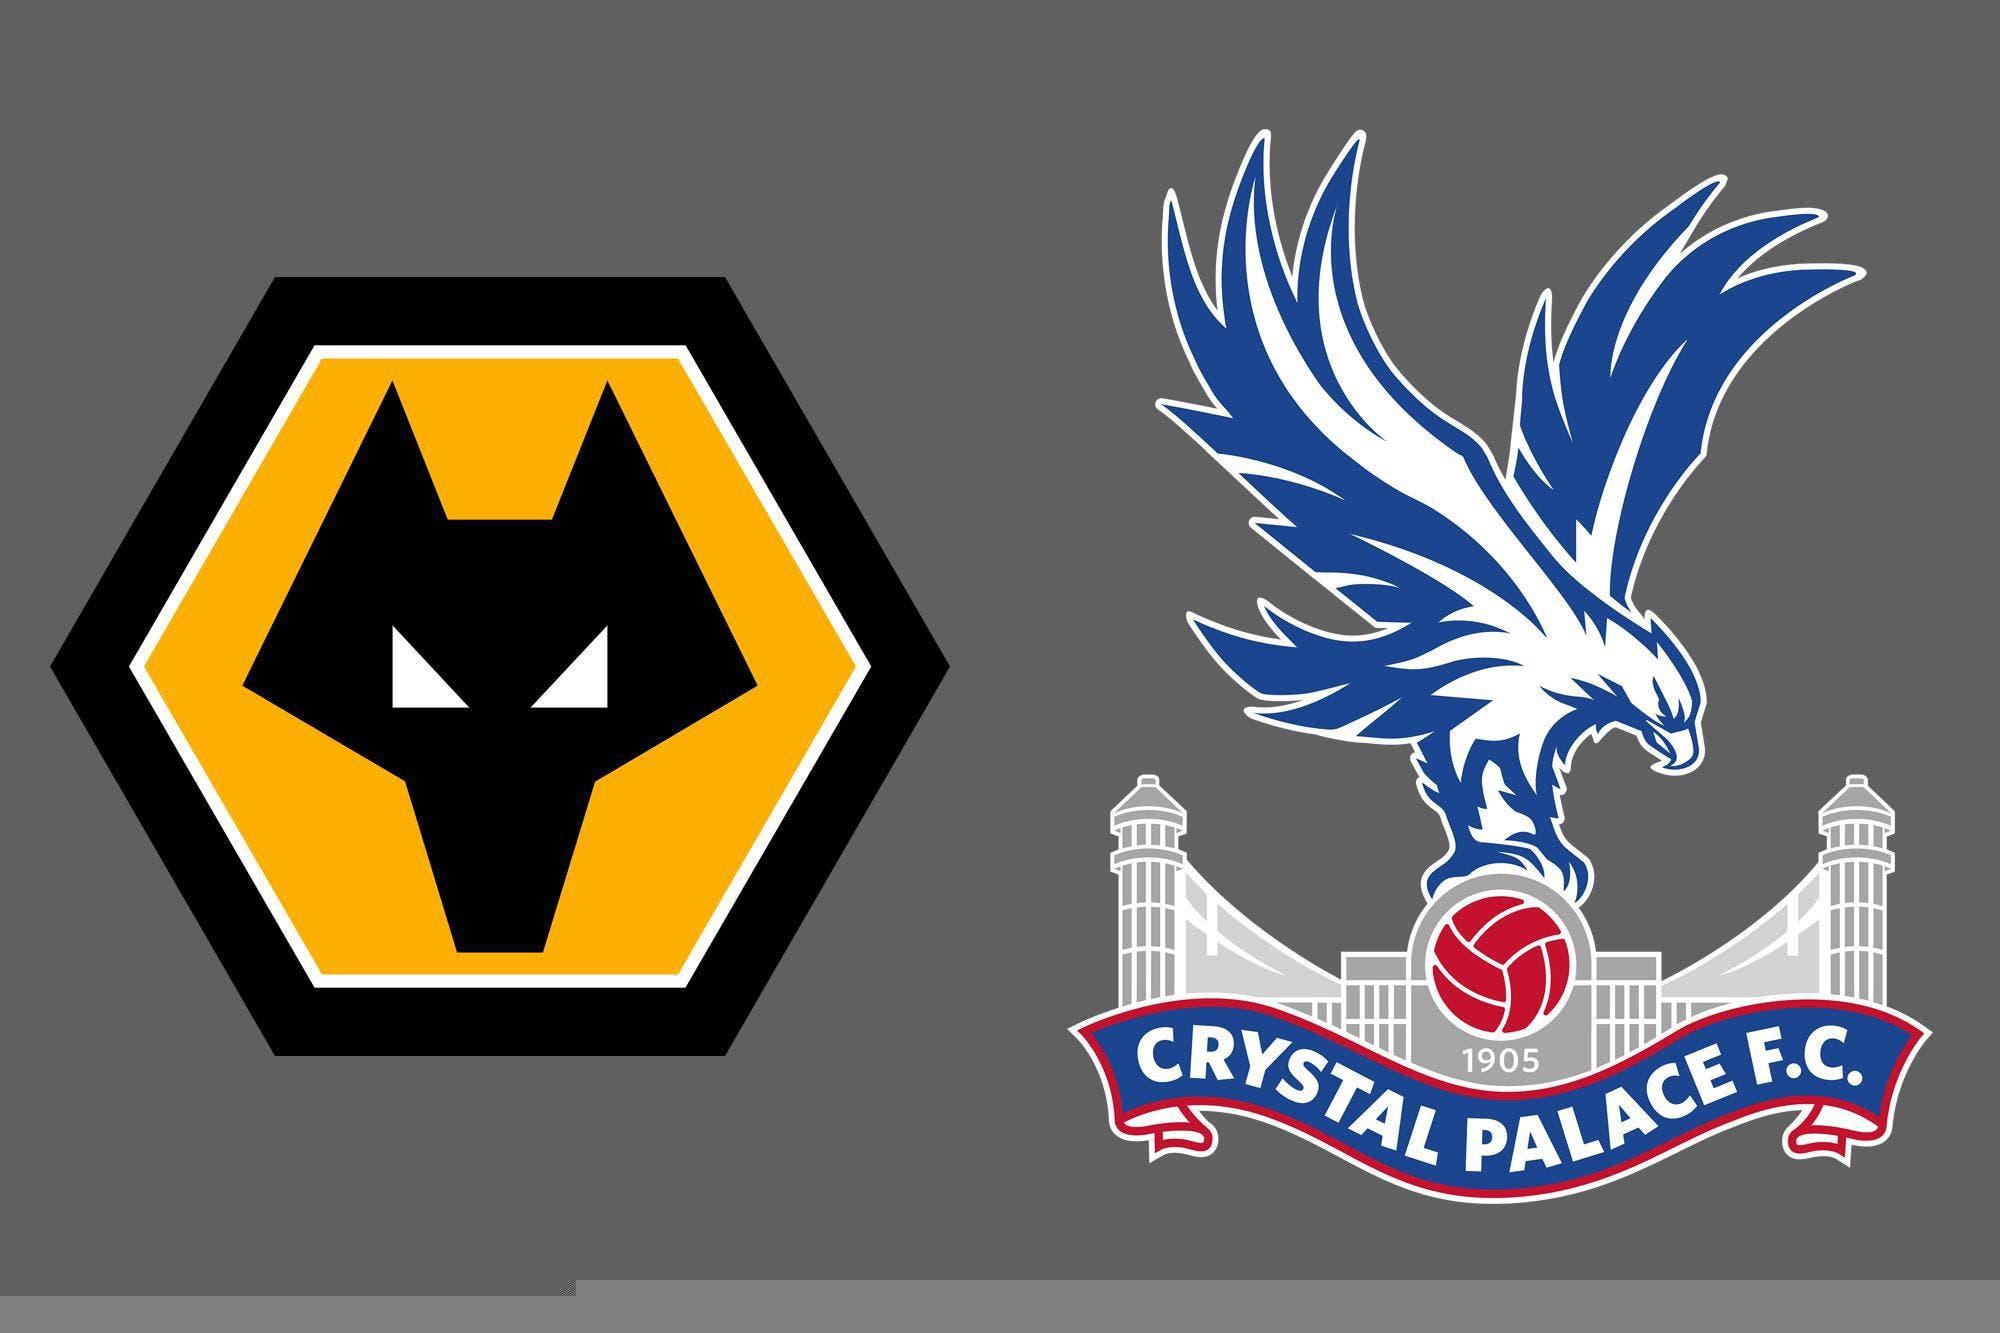 Premier League de Inglaterra: Wolverhampton Wanderers venció por 2-0 a Crystal Palace como local